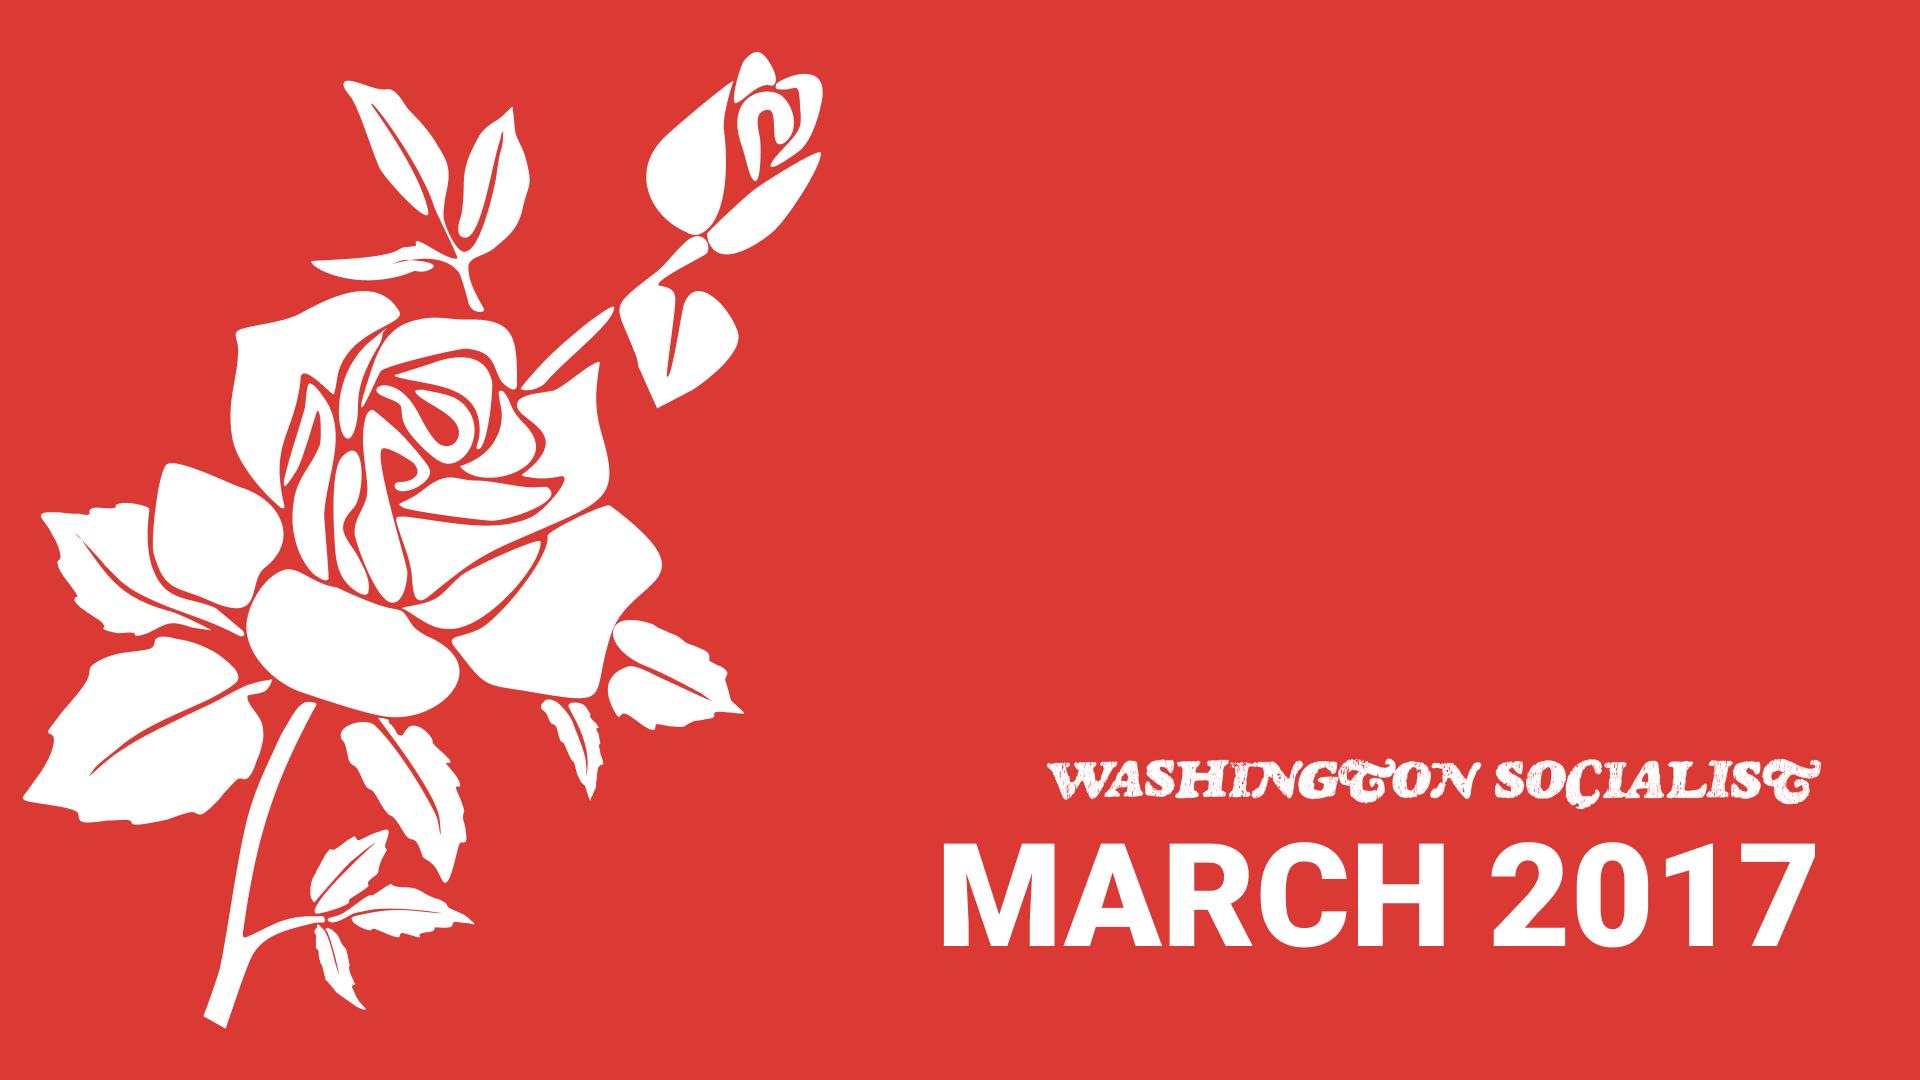 Washington Socialist Cover, March 2017